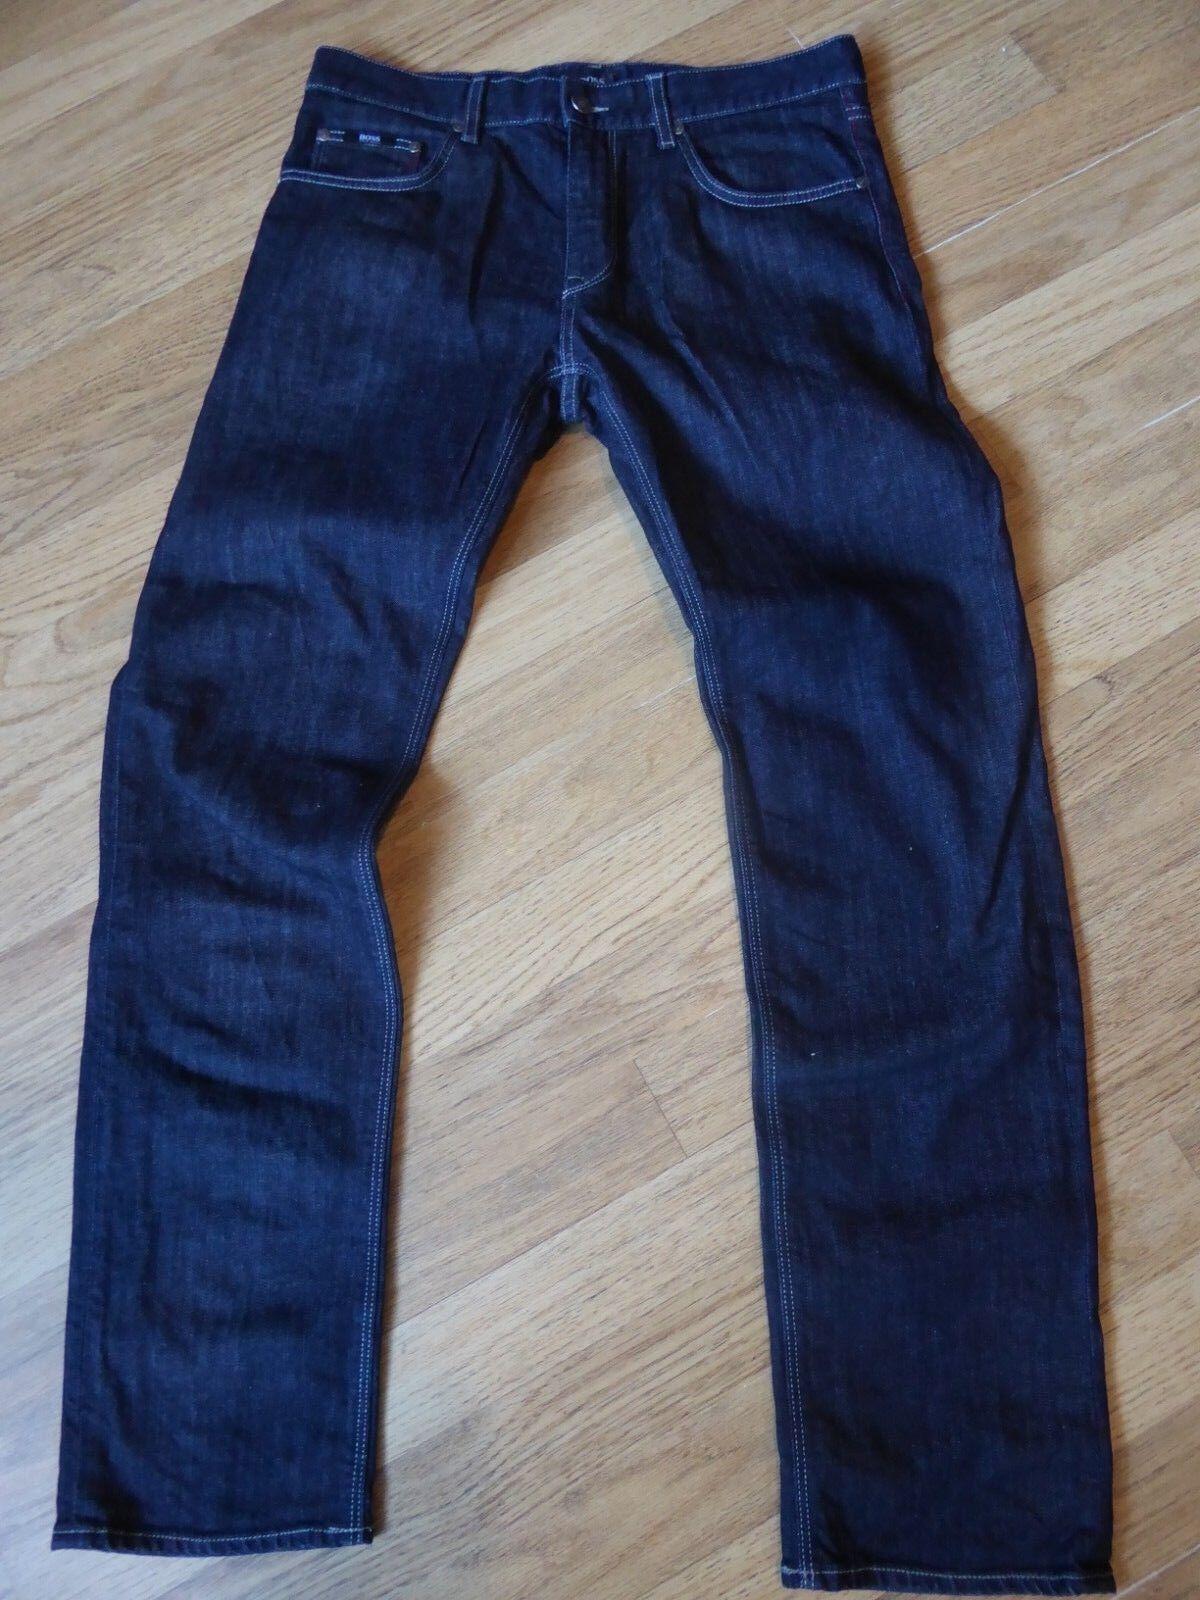 Mens HUGO BOSS jeans - Größe 32 32 mint condition condition condition 2681b6